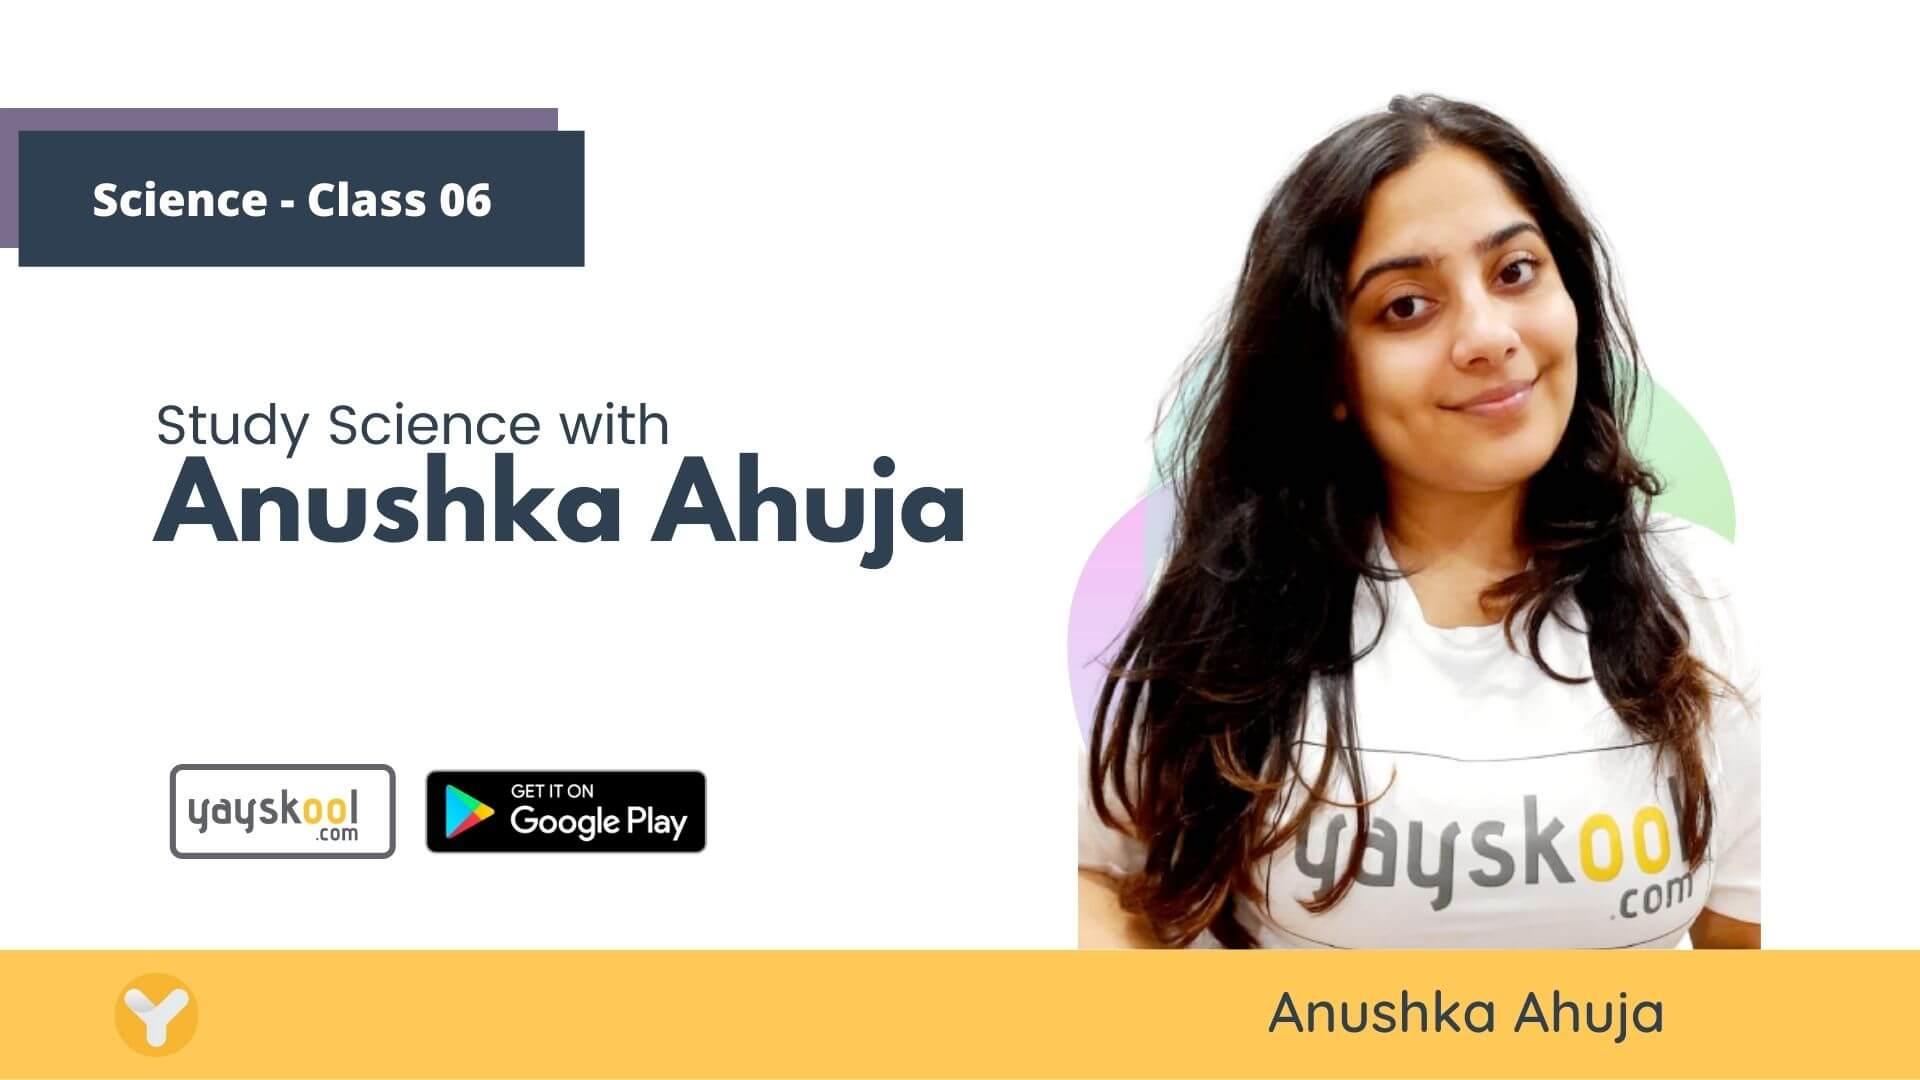 course-class06-science-anushka-ahuja